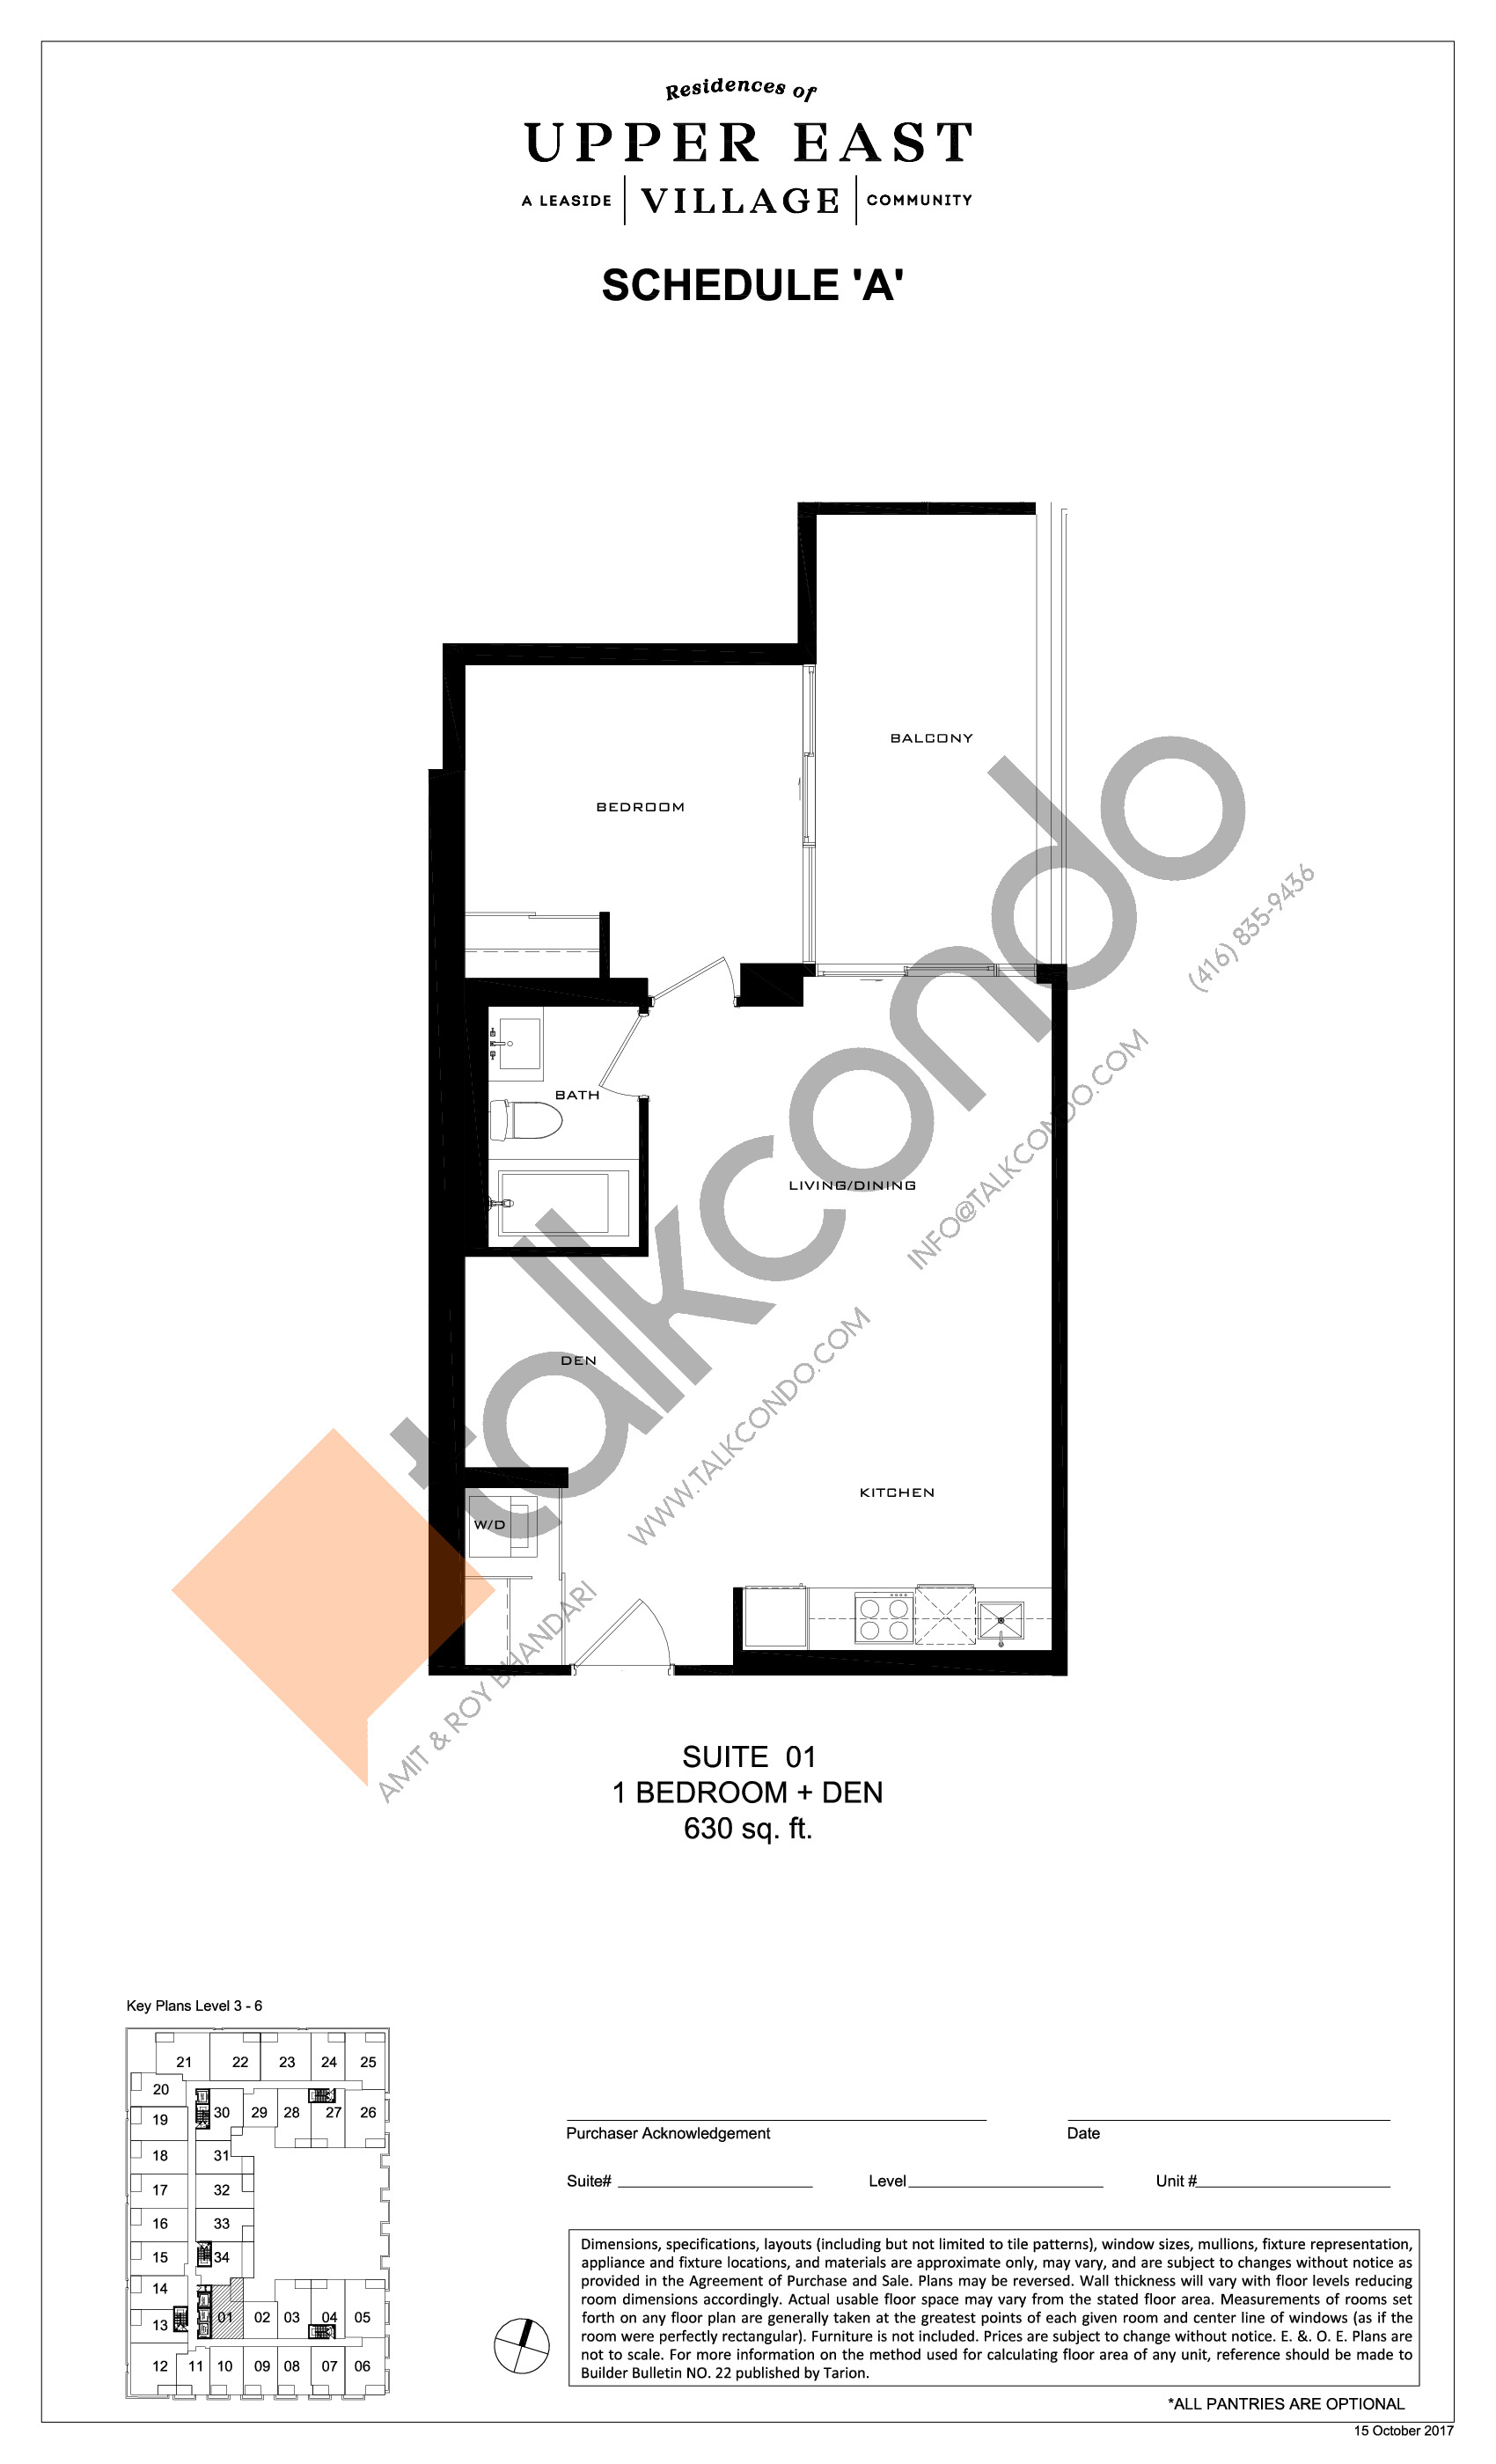 Suite 01 Floor Plan at Upper East Village Condos - 630 sq.ft